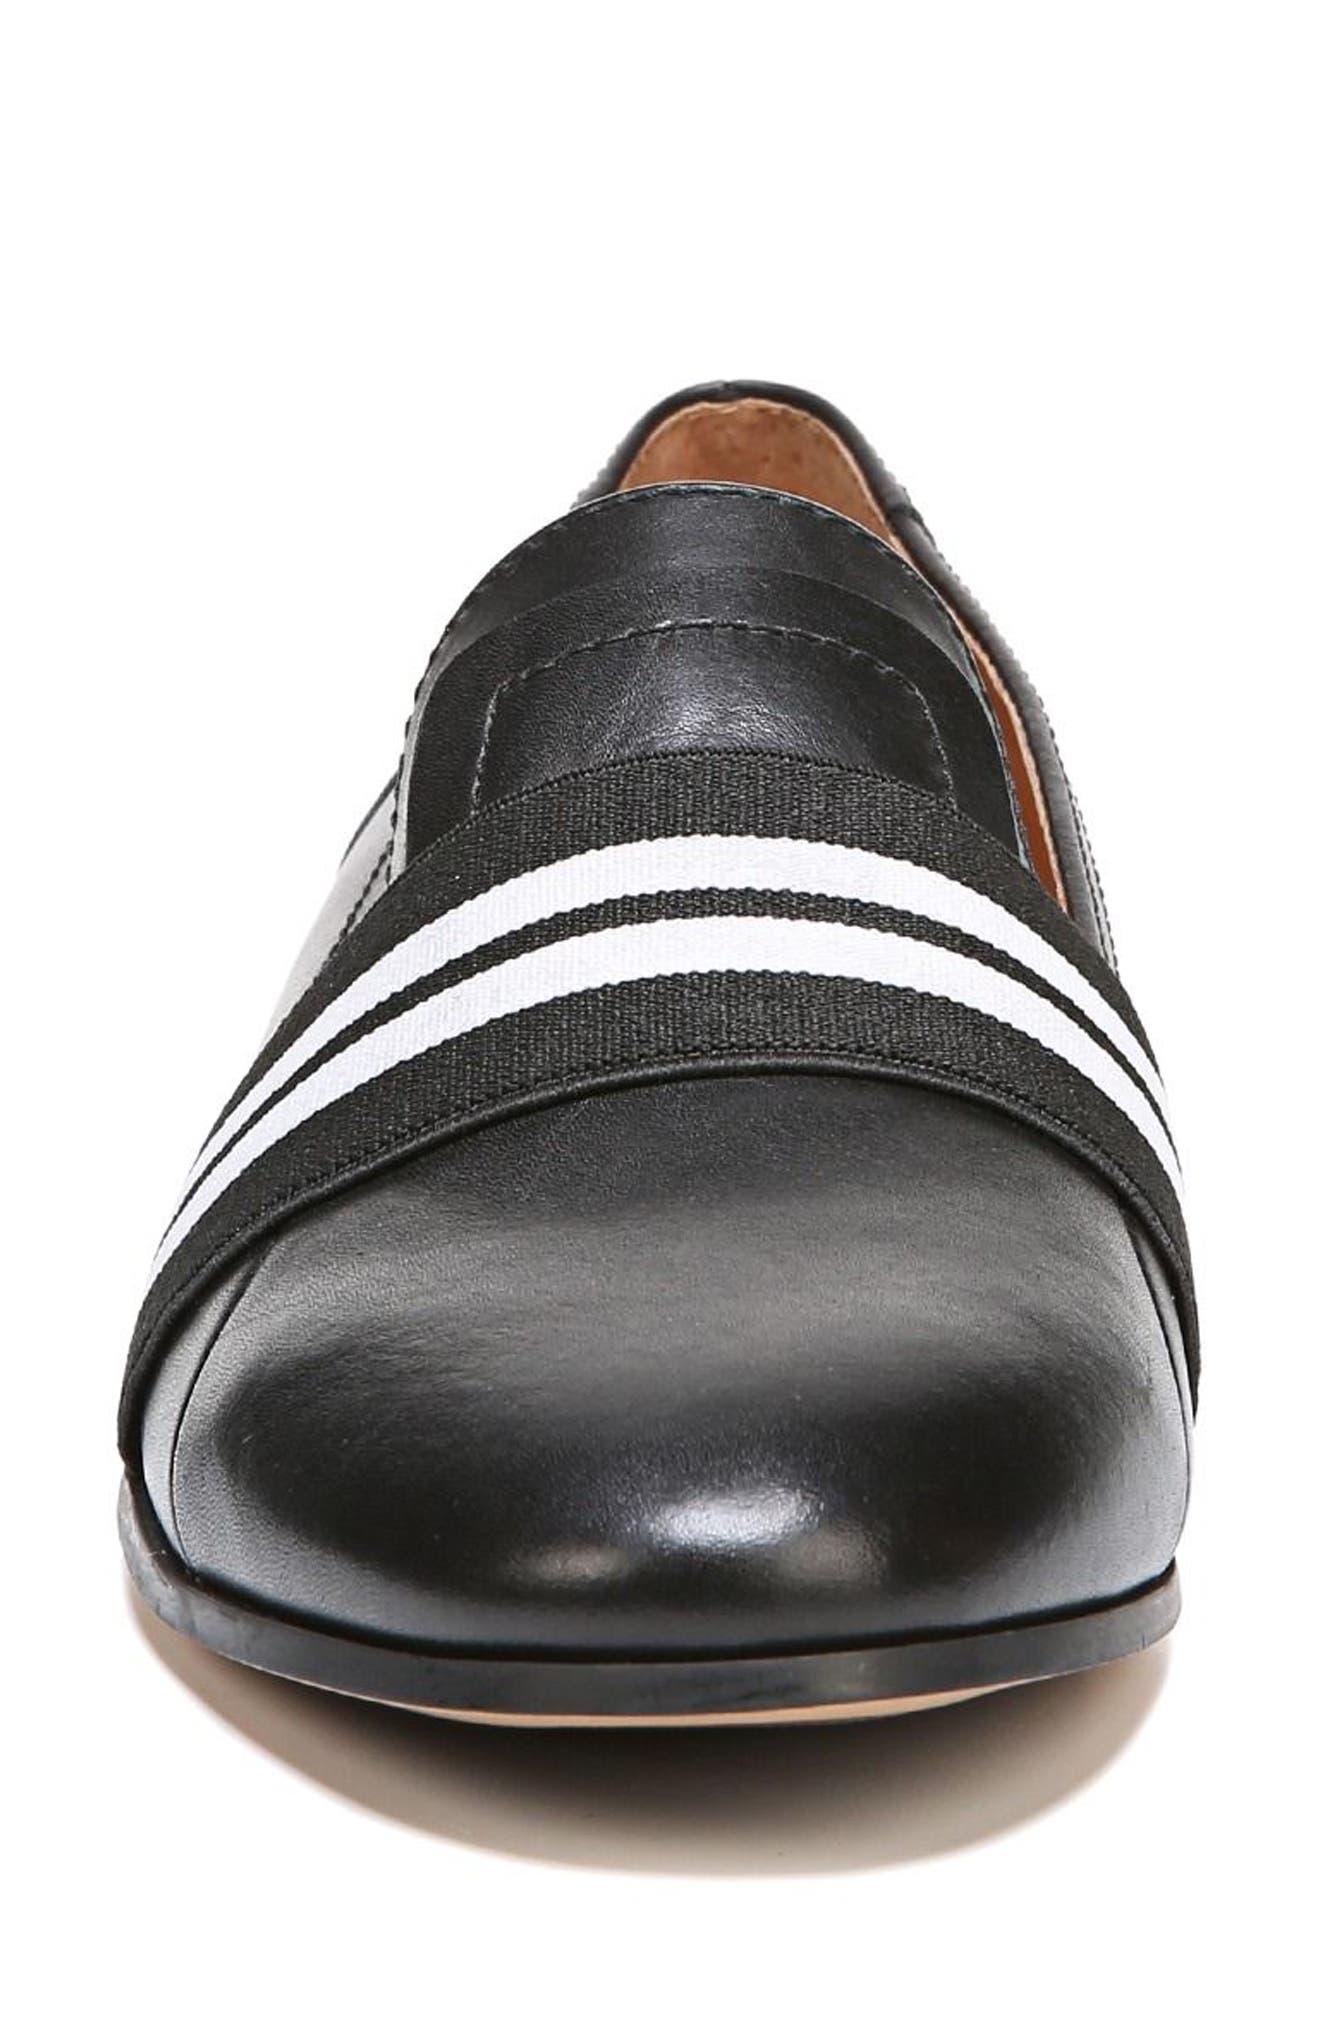 Odyssey Loafer,                             Alternate thumbnail 4, color,                             001